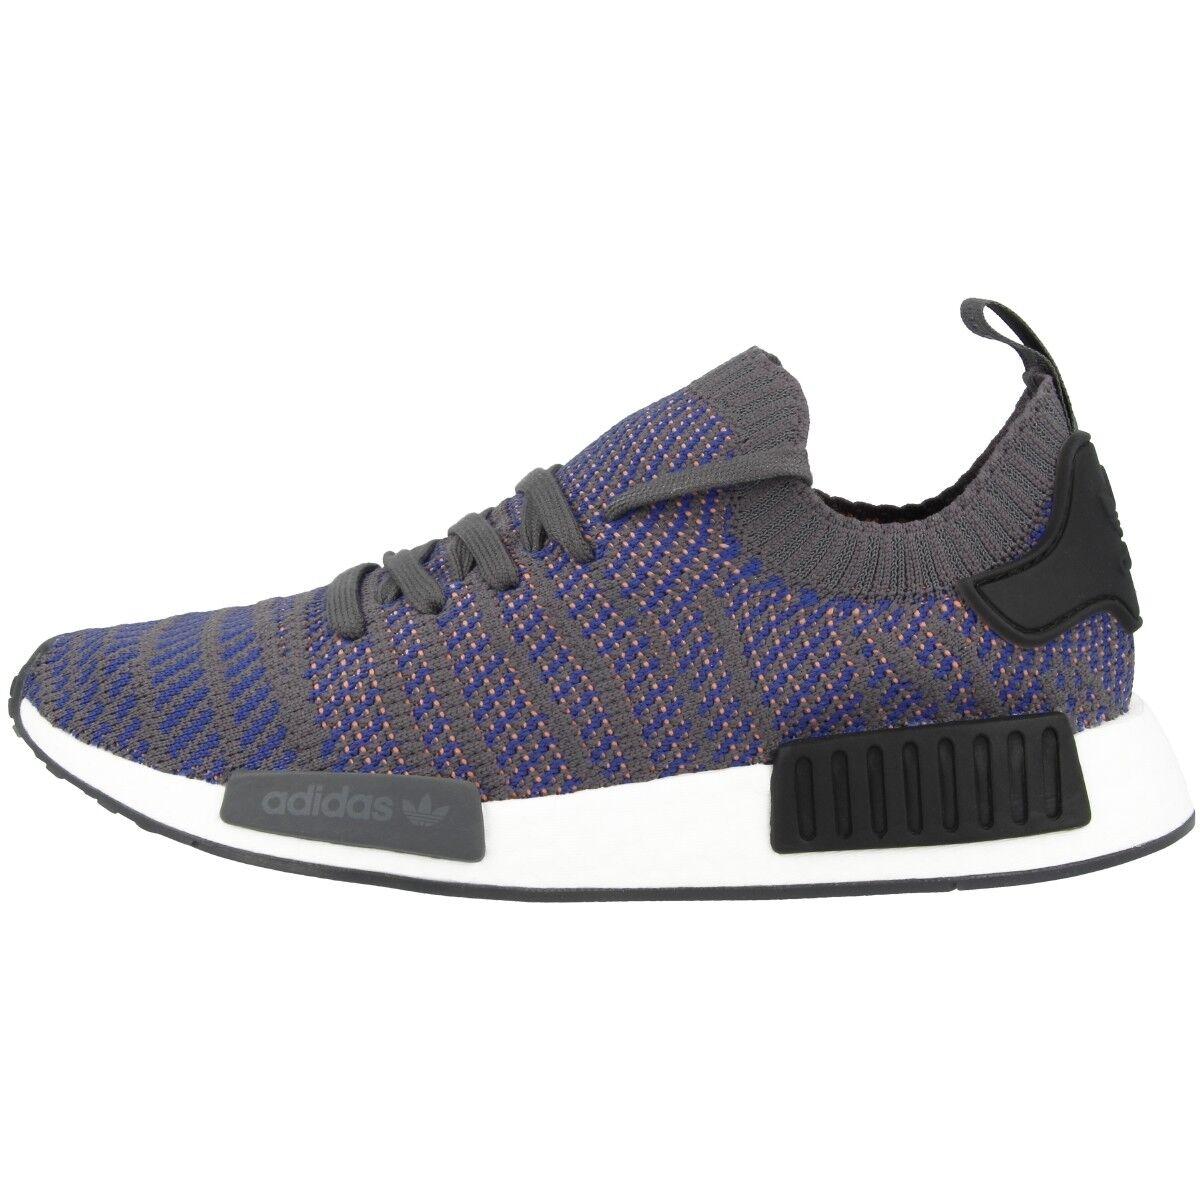 Adidas NMD_R1 NMD_R1 NMD_R1 STLT PK Primeknit Zapatos Herren Freizeit Sneaker res Azul CQ2388 818b39